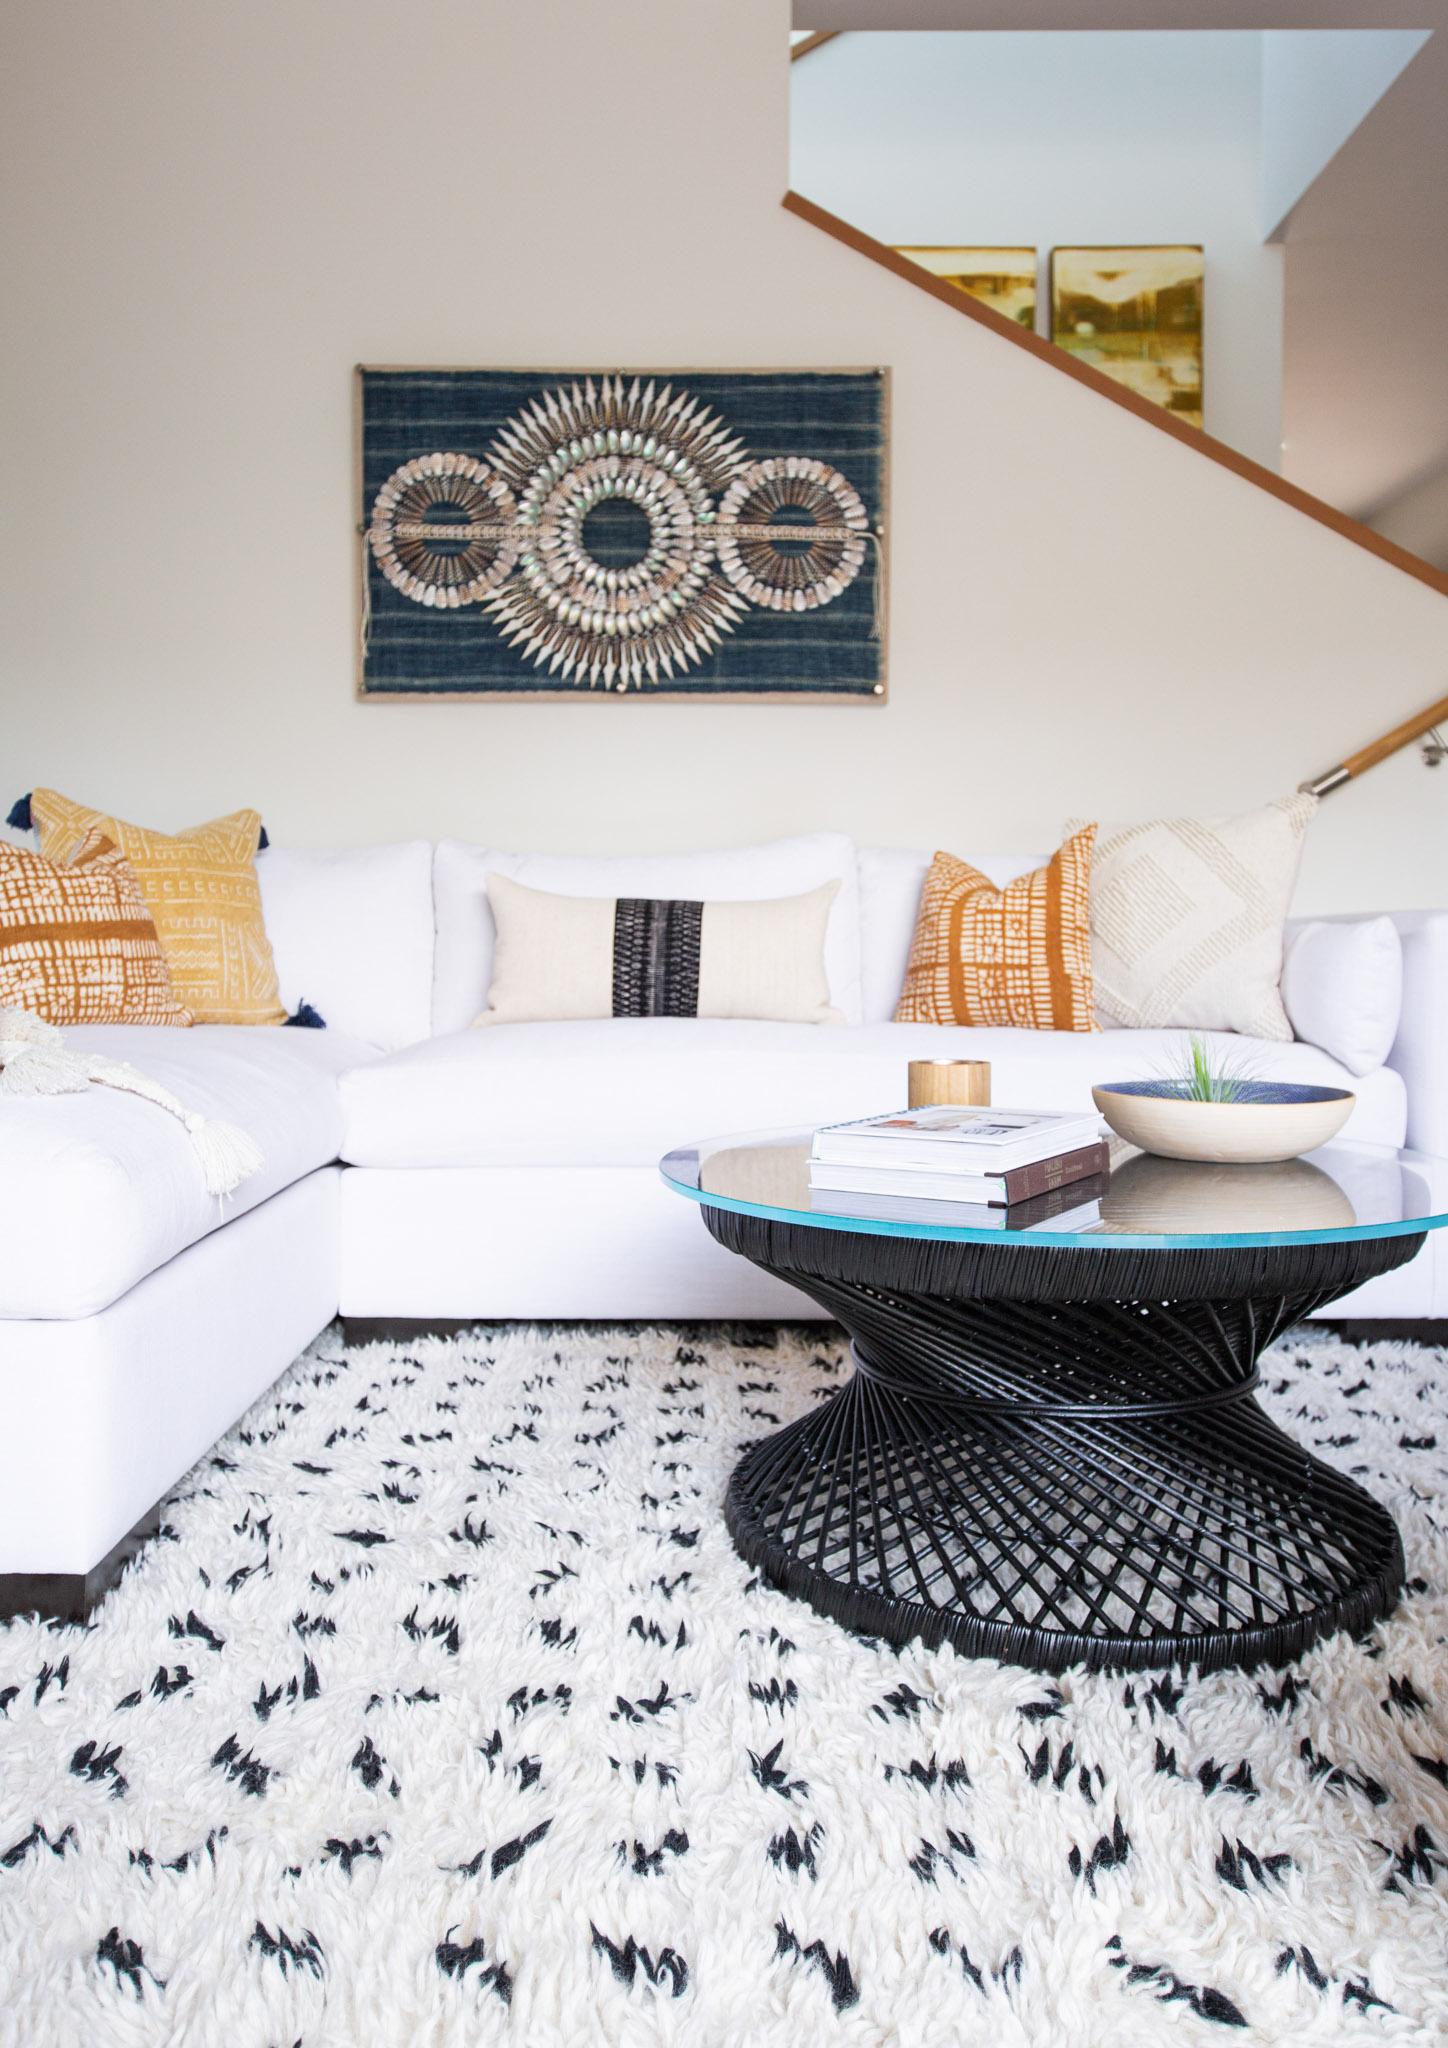 Jodi G Designs | Santa Barbara Interior Design Lanscape -1-19.jpg